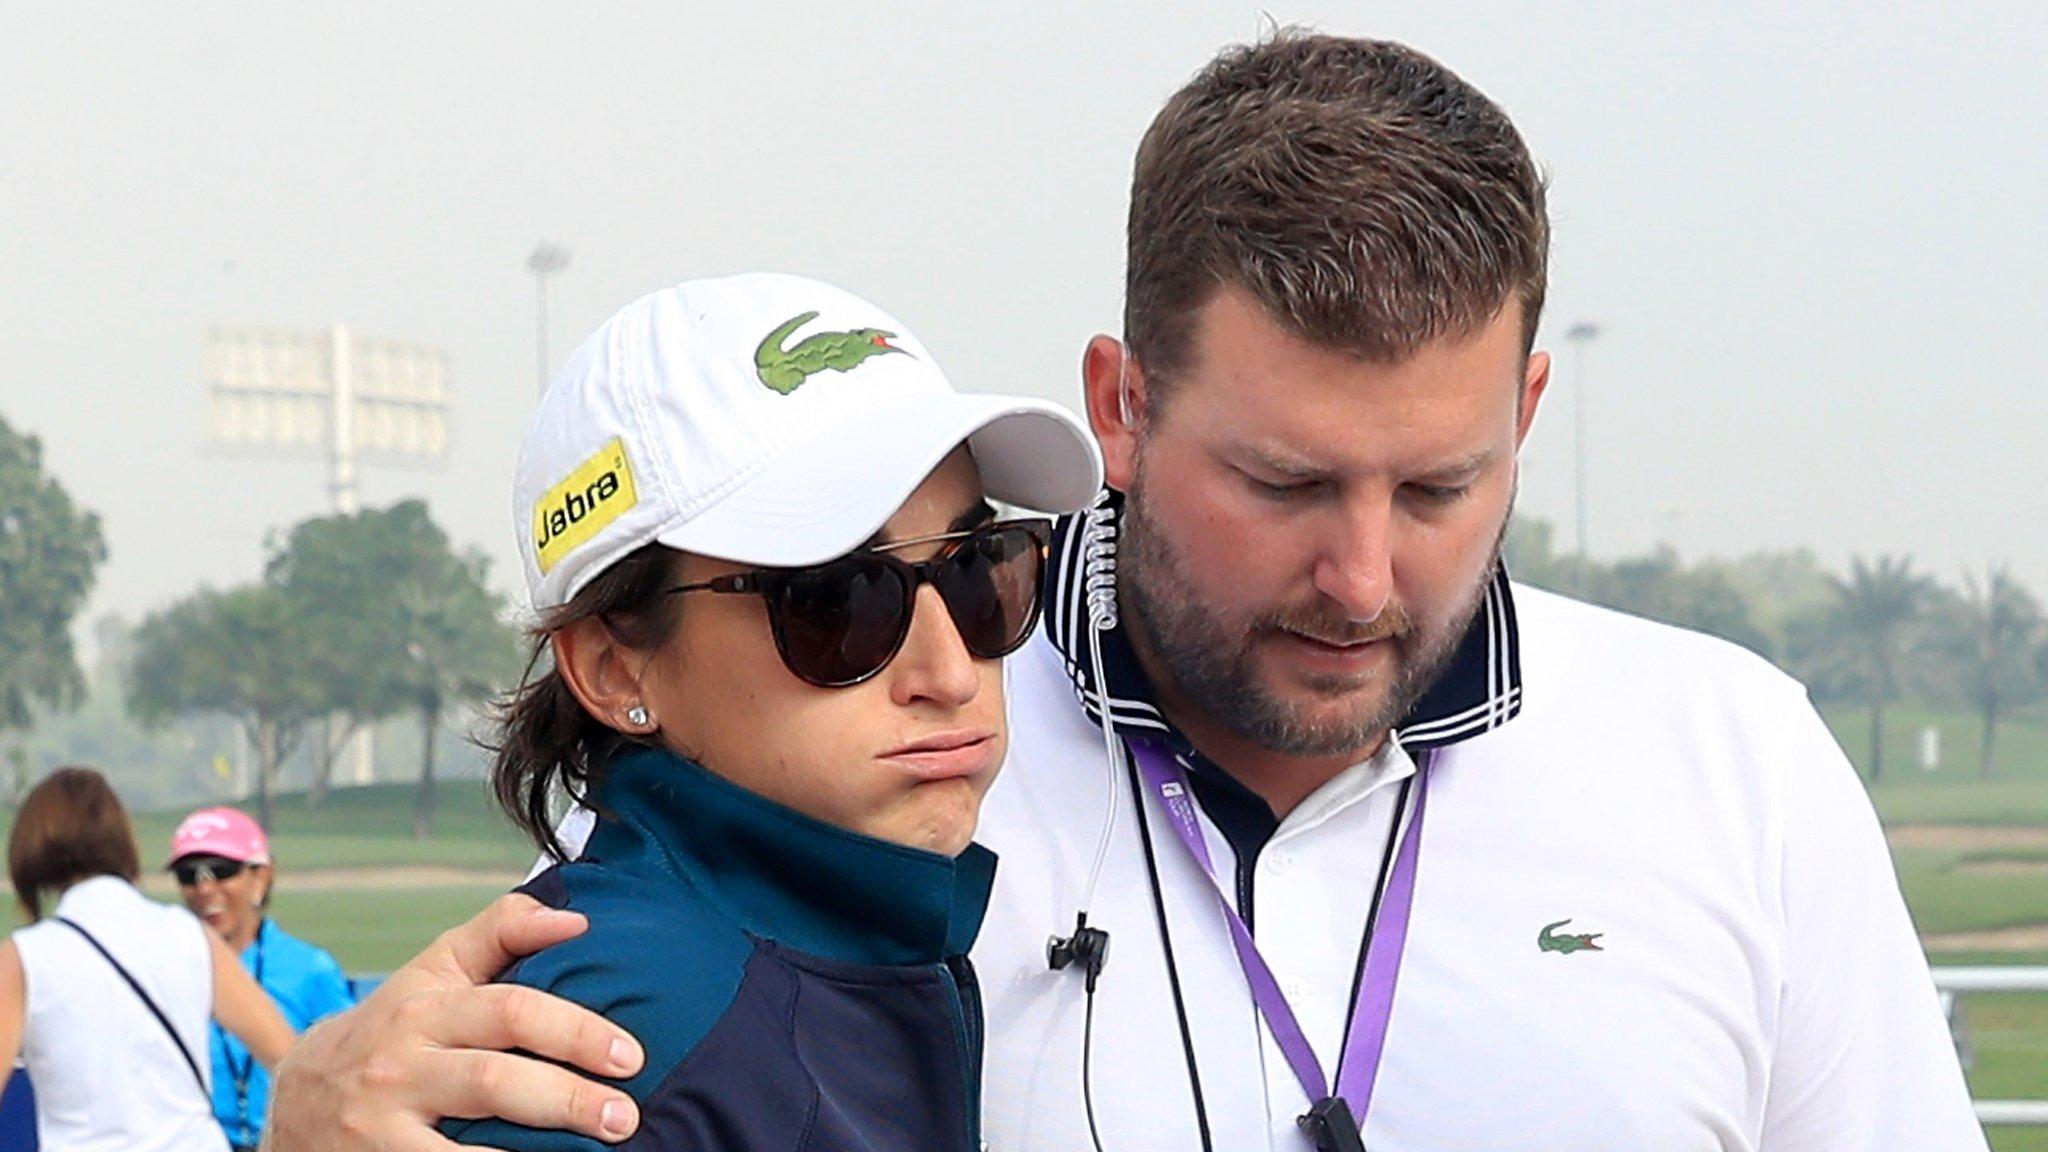 Dubai Ladies Masters: Caddie dies after collapsing during first round